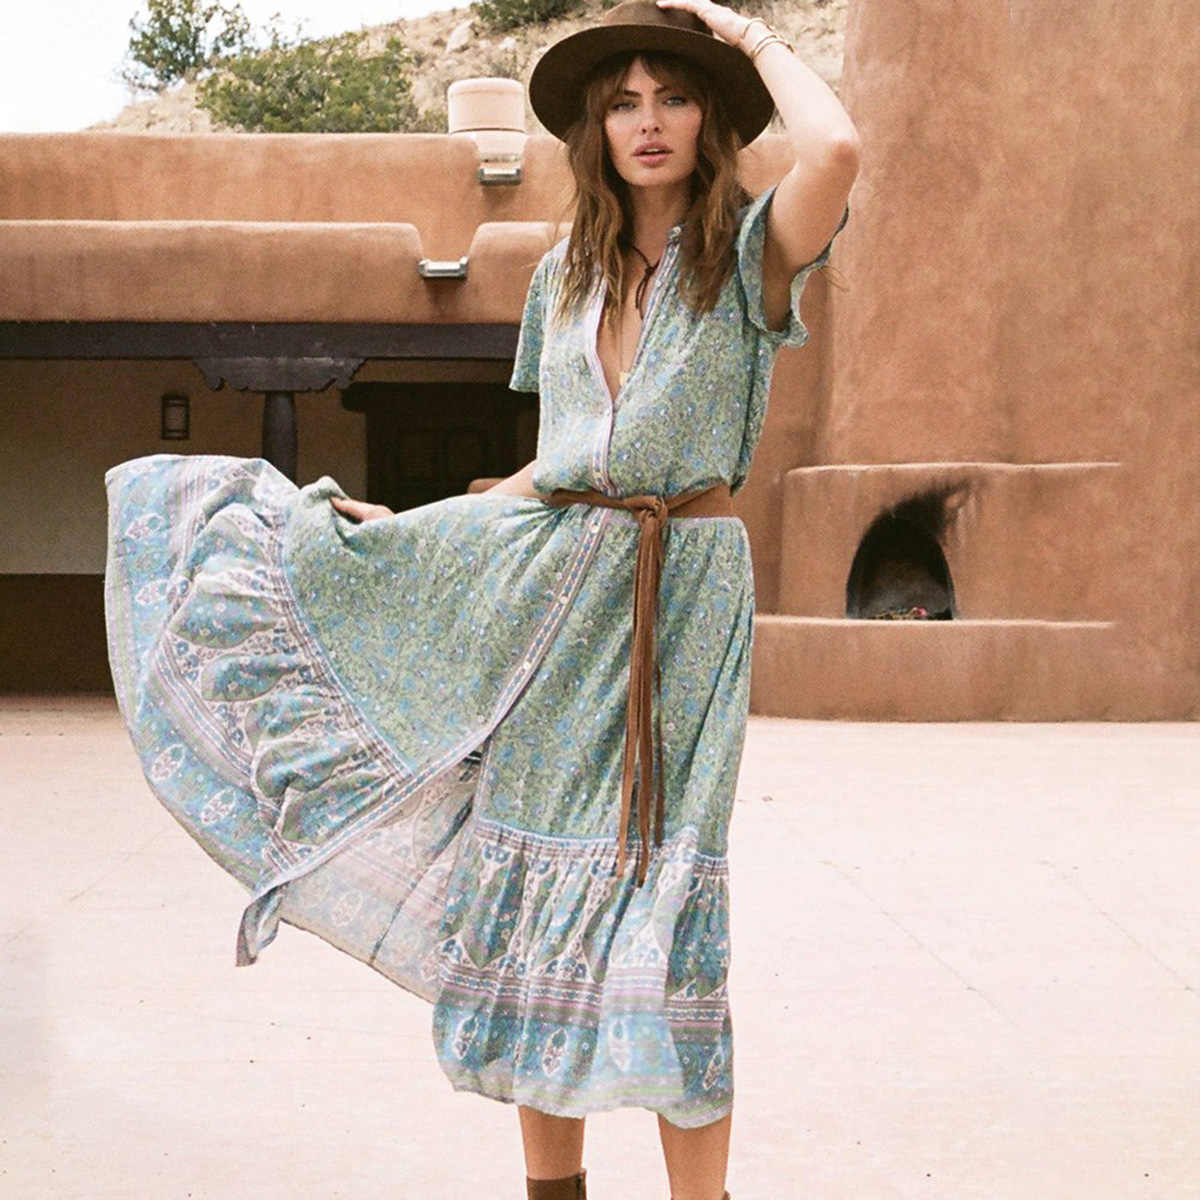 575726155a4 Floaty Jasmine Midi Dress Women Summer Short Sleeve V neck Button Down Sexy  Dresses Ladies Boho